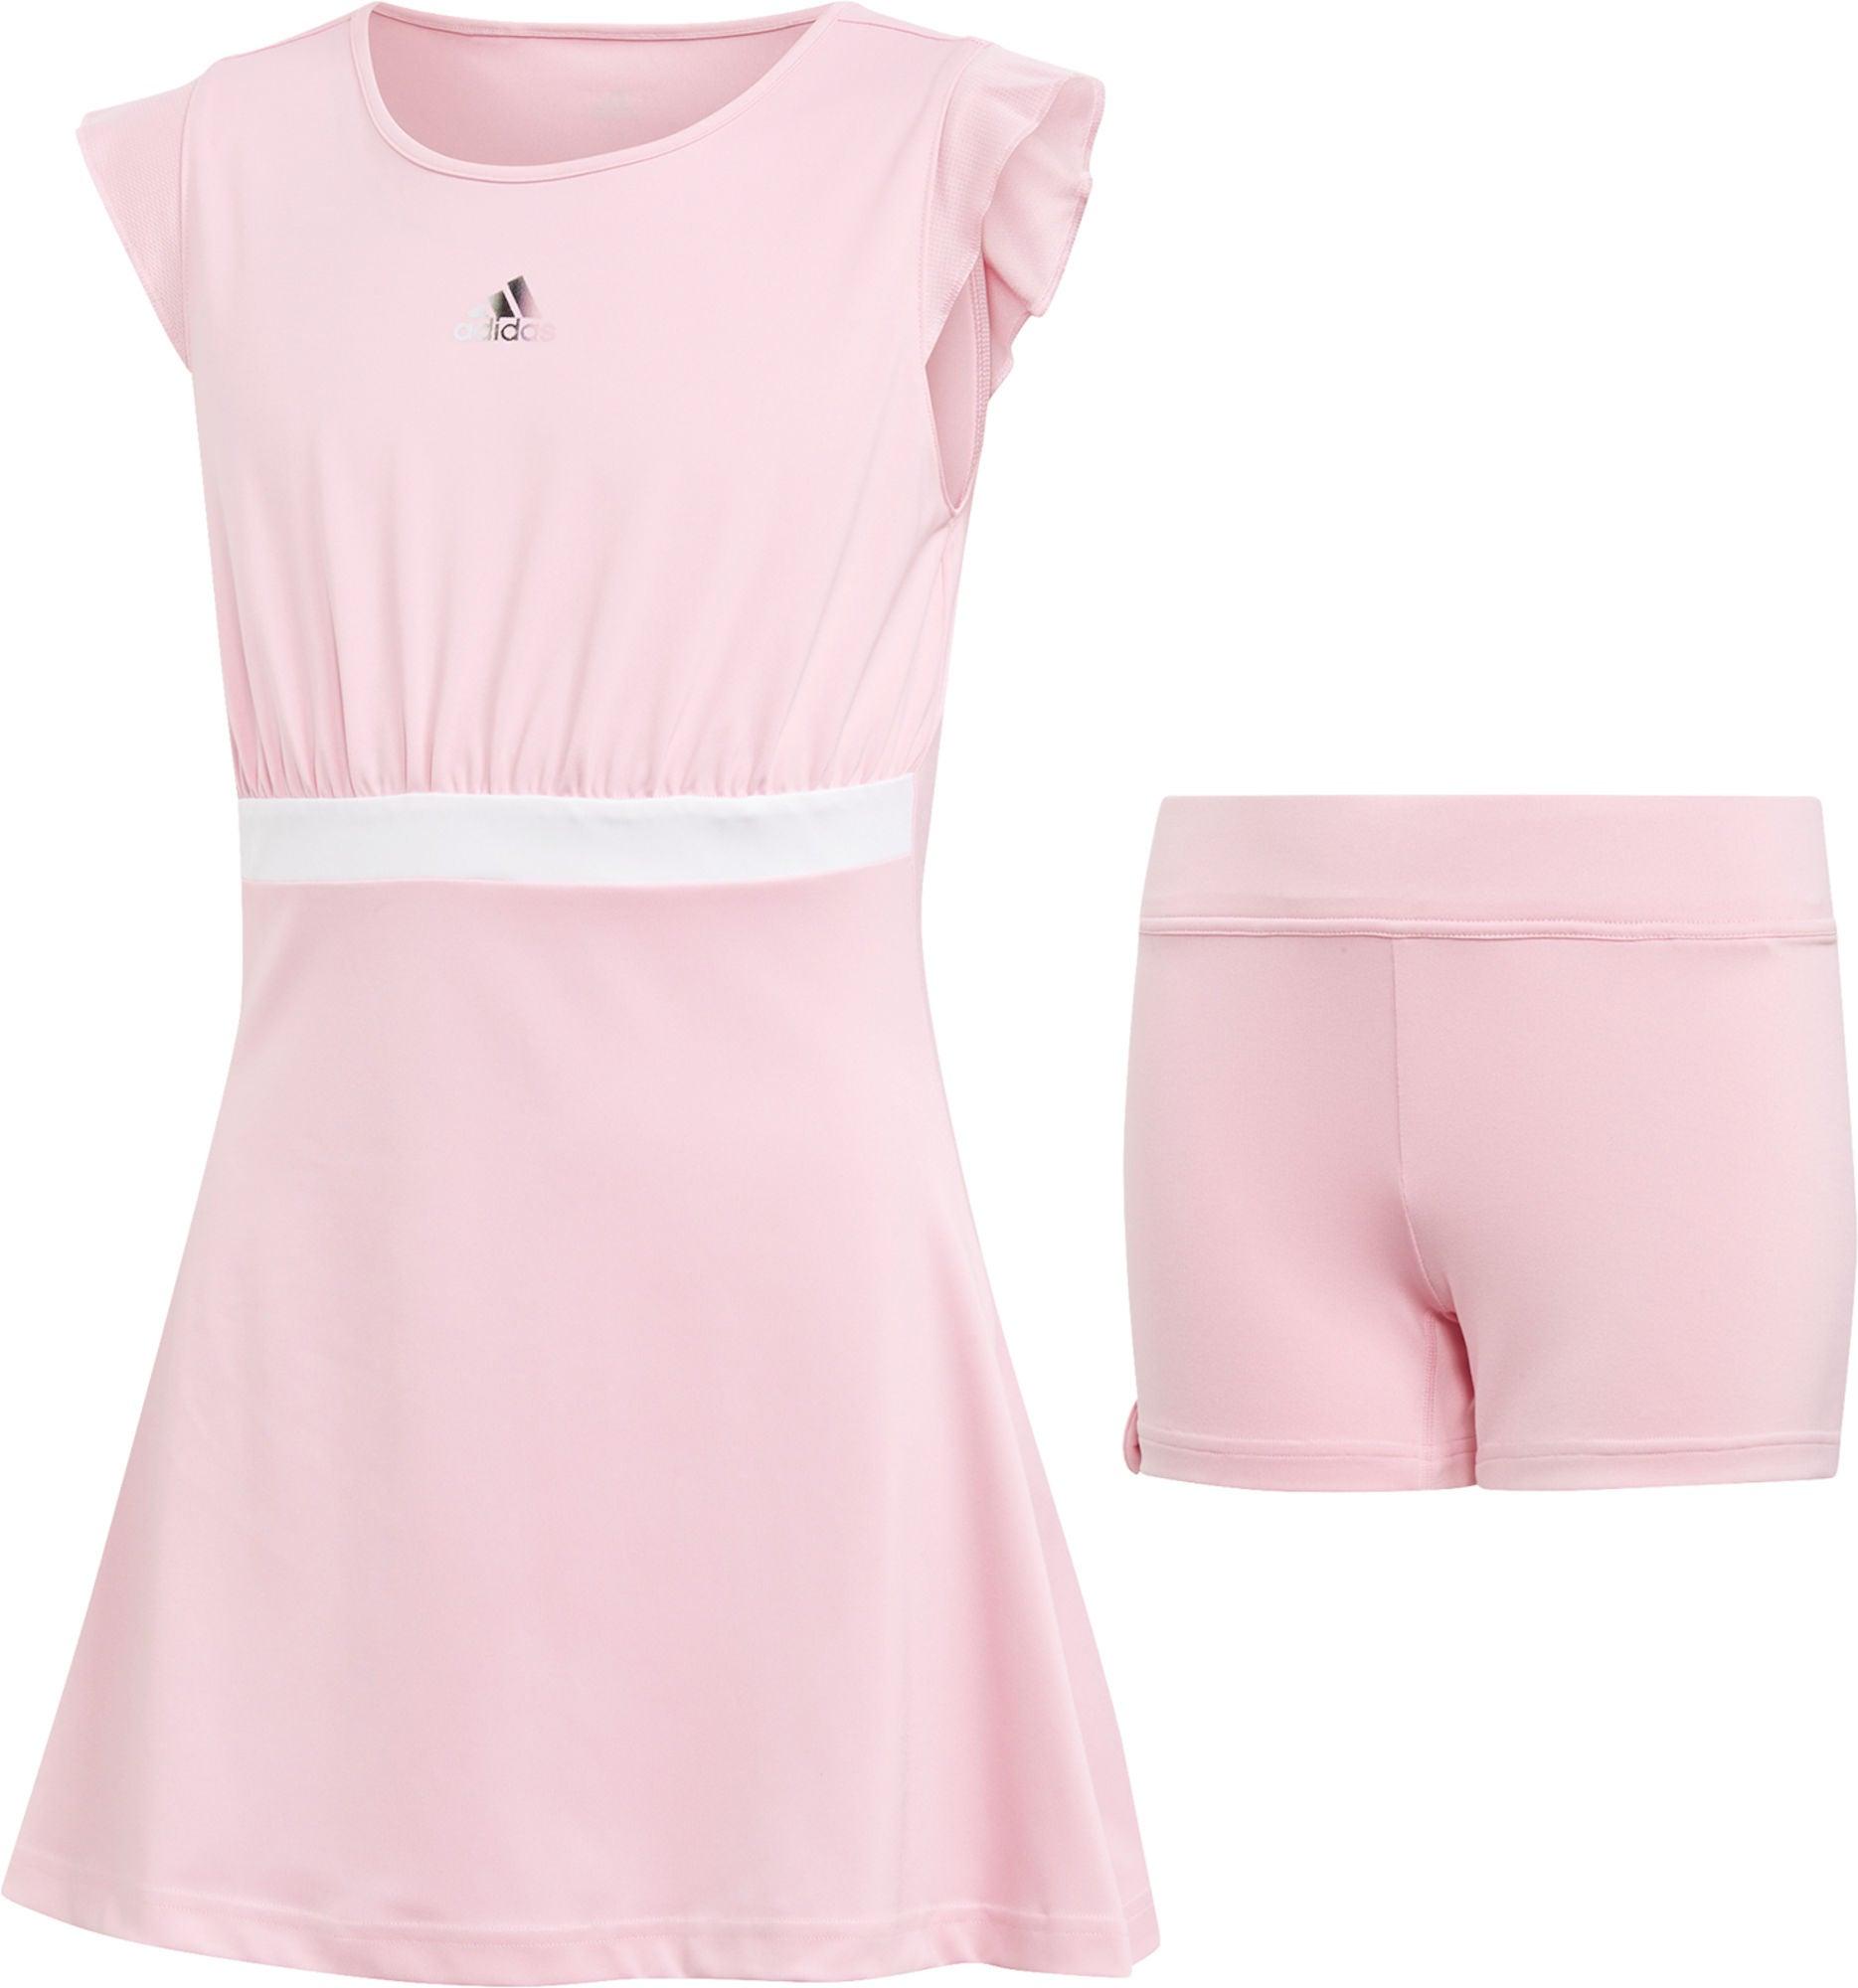 c3e5b2209ae Køb Adidas Girls Ribbon Kjole, Pink | Jollyroom